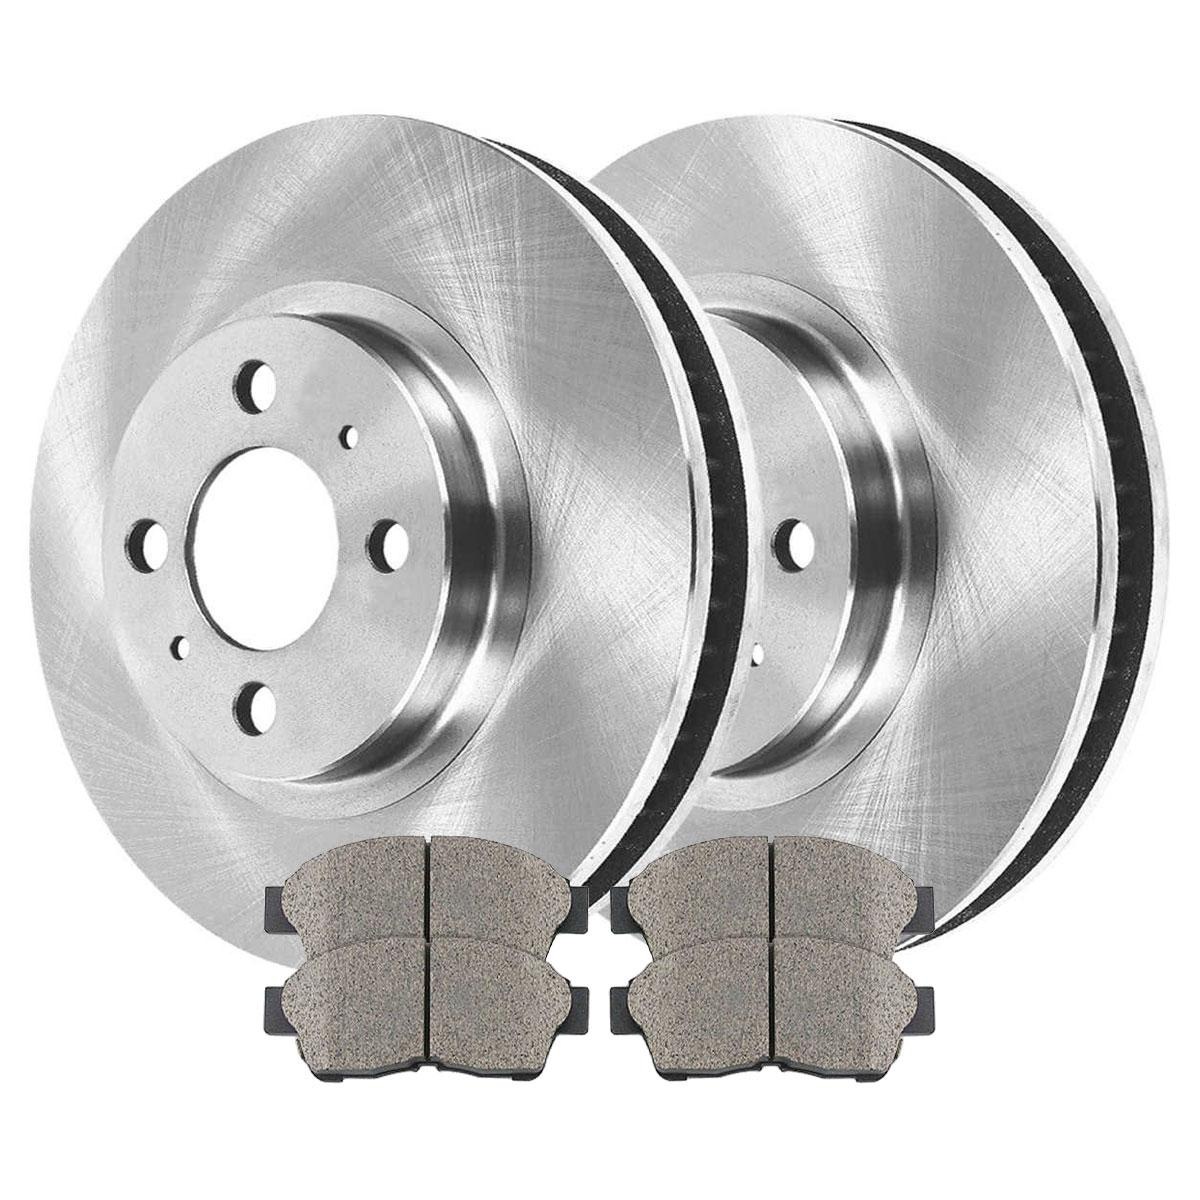 Prime Choice Auto Parts CBO413711088COD Pair of 2 Disc Rotors and 4 Premium Ceramic Brake Pads Set